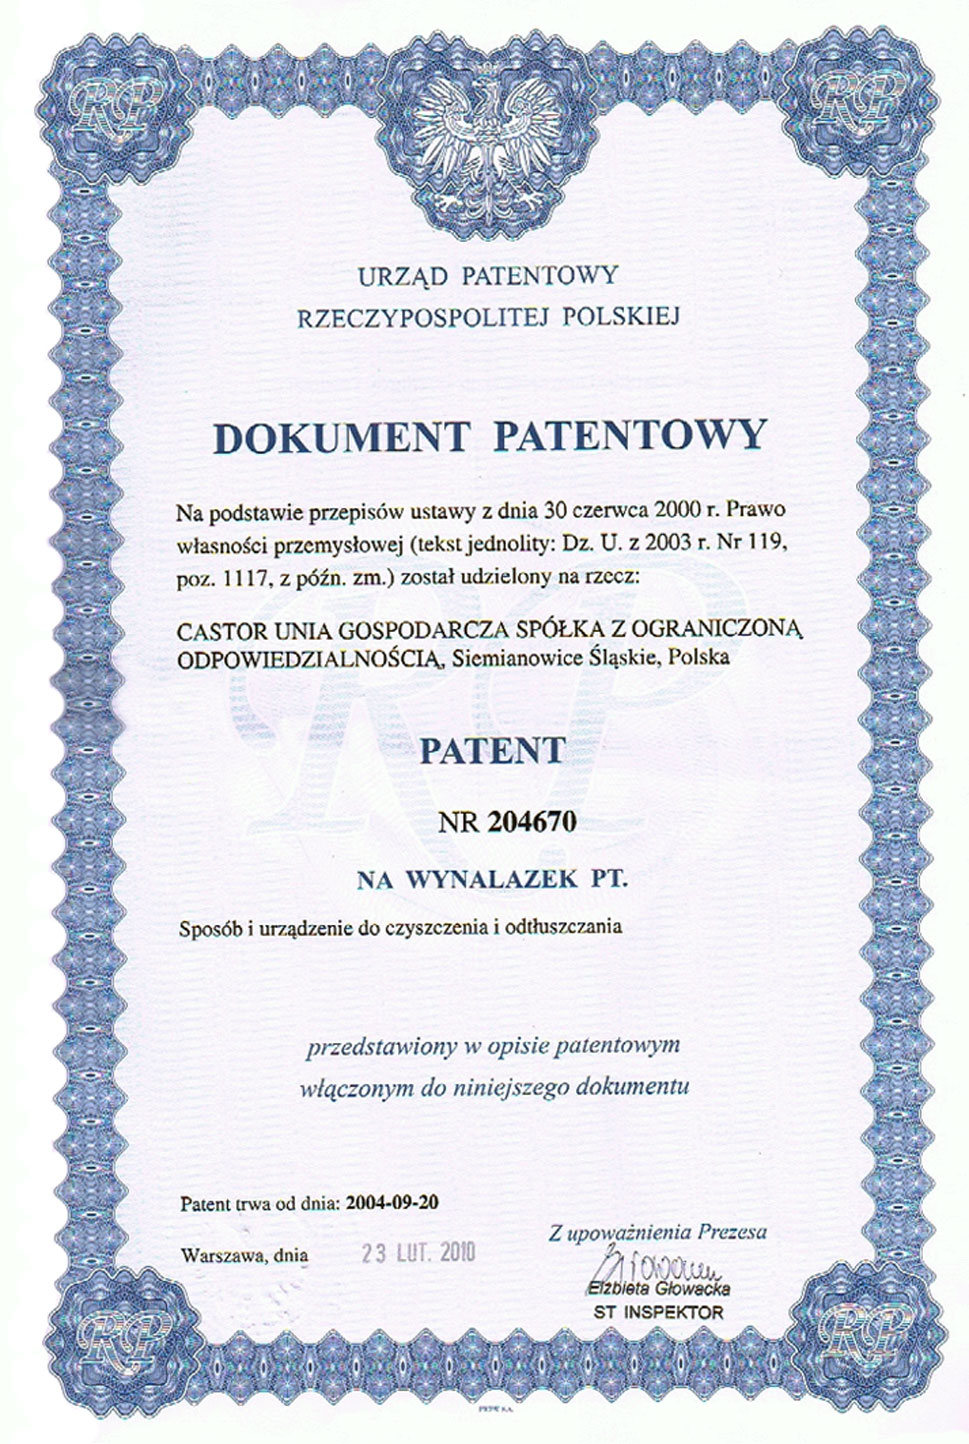 Dokument patentowy nr 204670